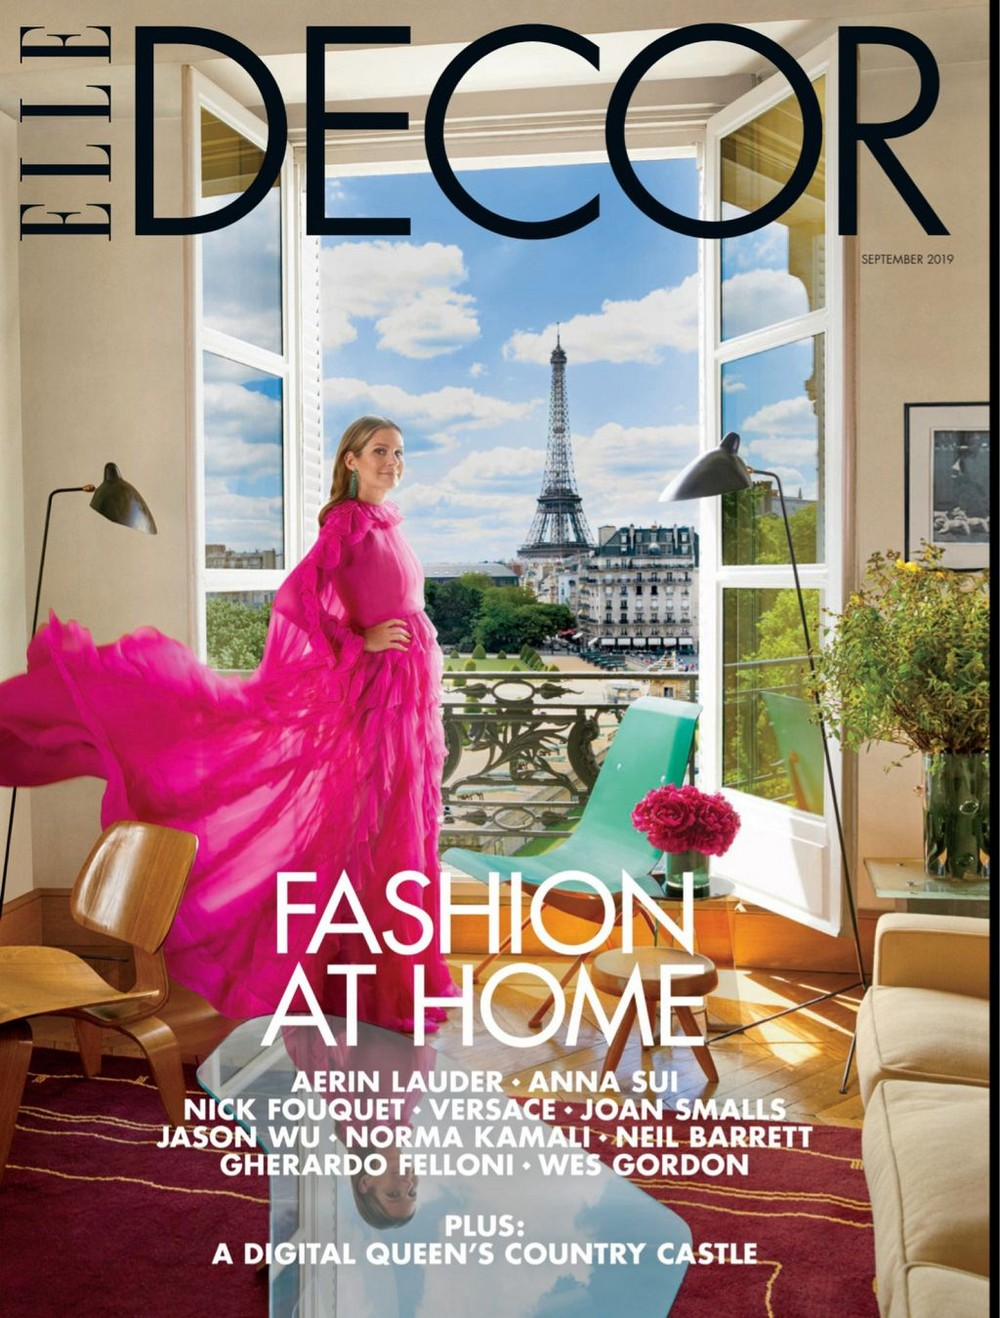 Elle Decor's New Issue Shows The Top Design Trends Inspired In Fashion elle decor Elle Decor's New Issue Shows The Top Design Trends Inspired In Fashion Elle Decors New Issue Shows The Top Design Trends Inspired In Fashion